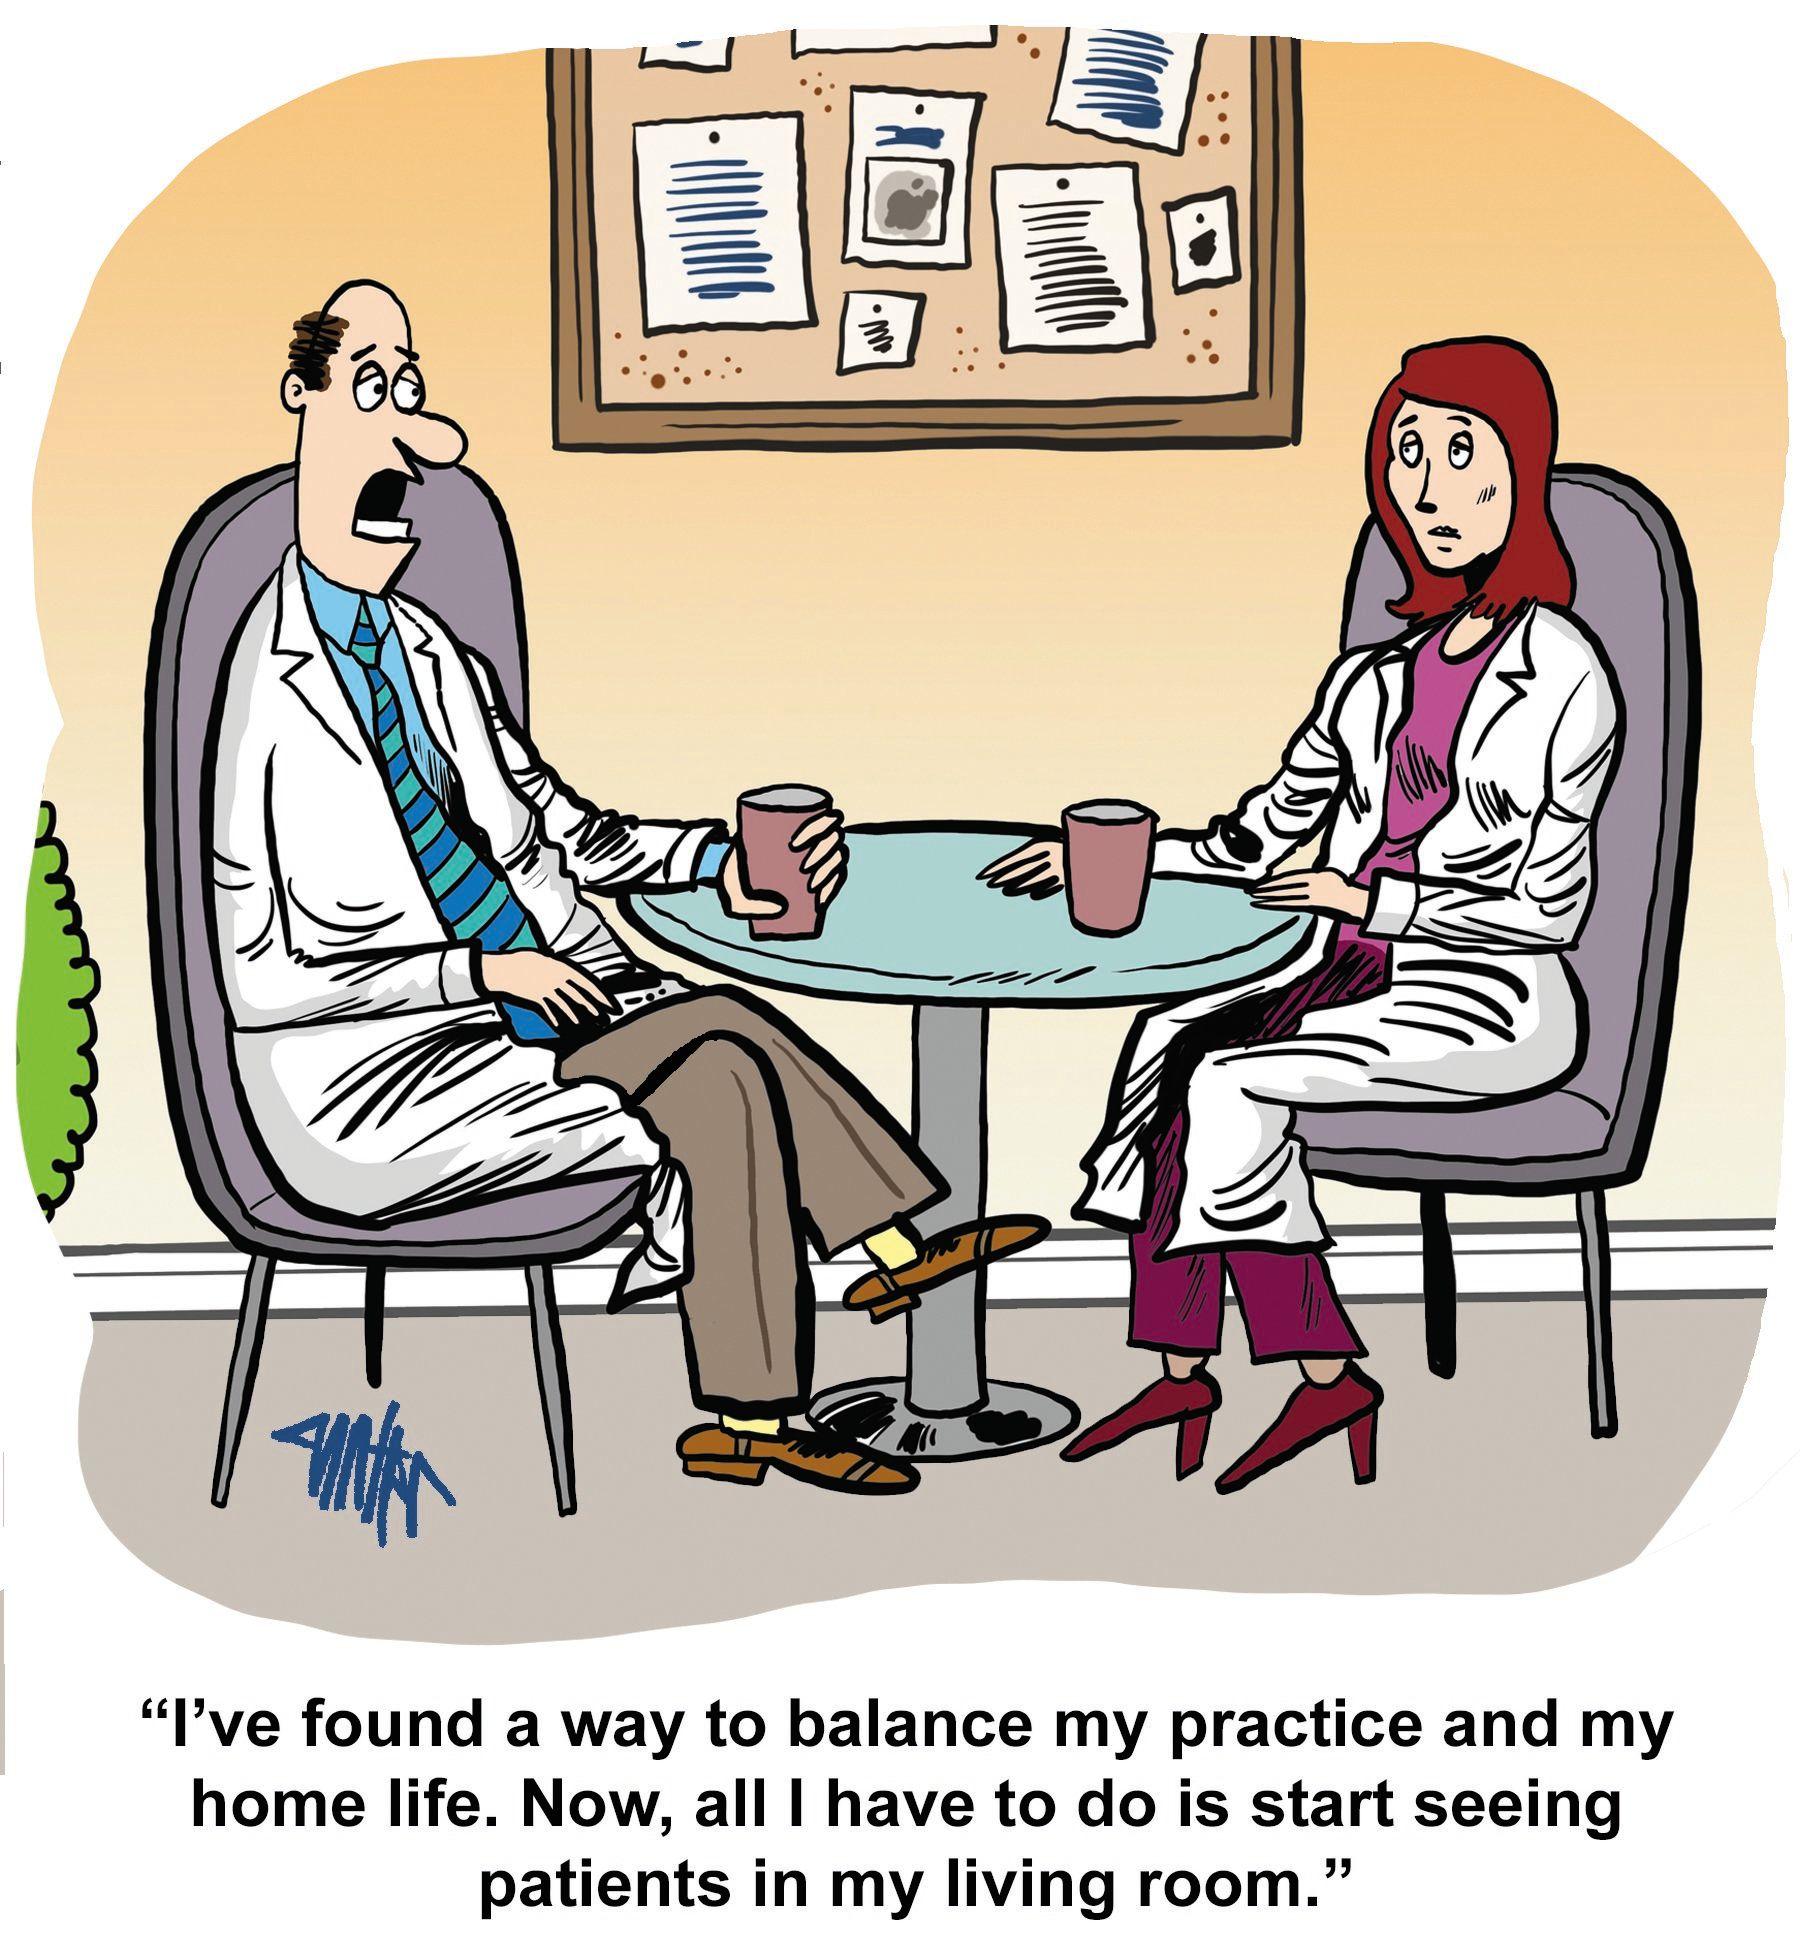 Funny Bone: Work-life balance